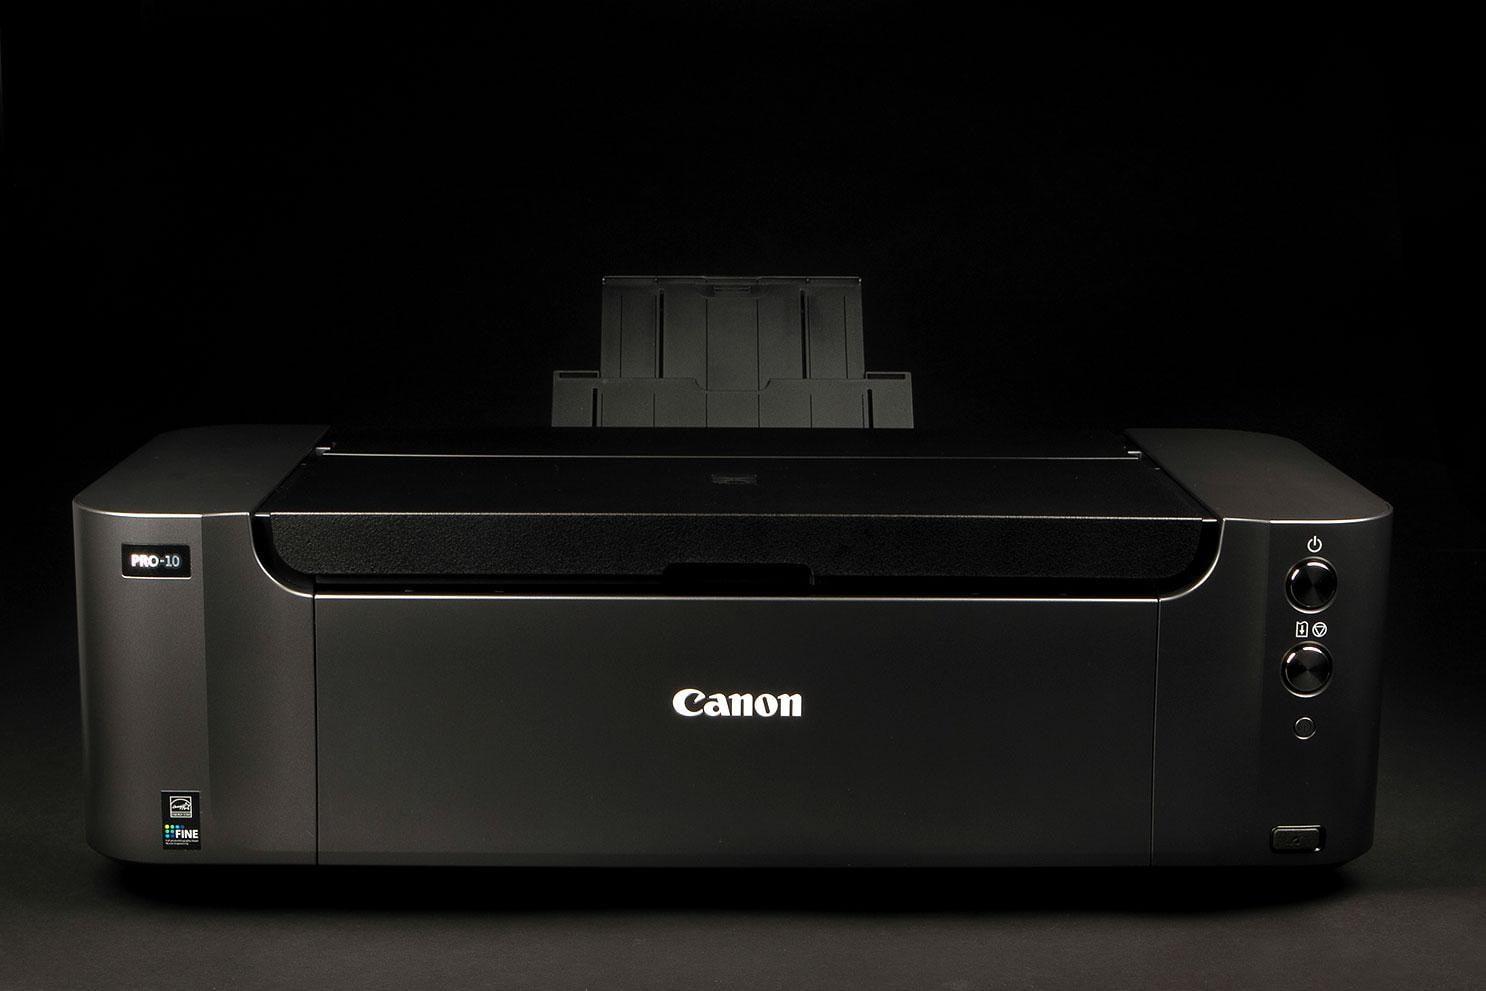 Canon Pixma Pro-10 review   Digital Trends